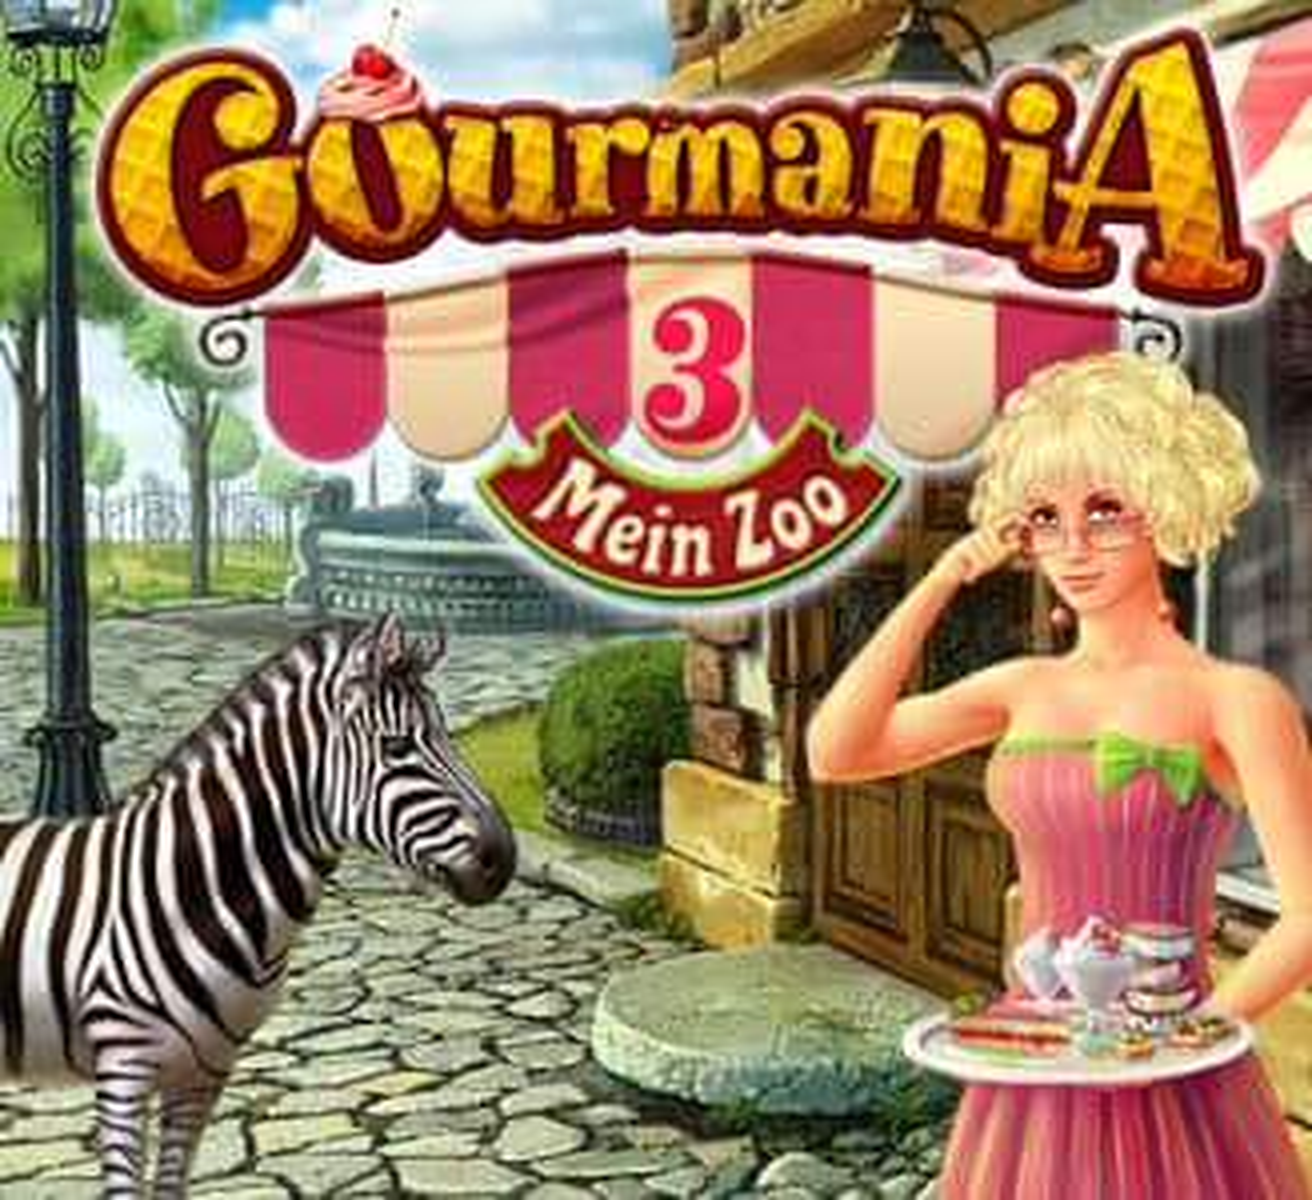 Gourmania 3: Mein Zoo